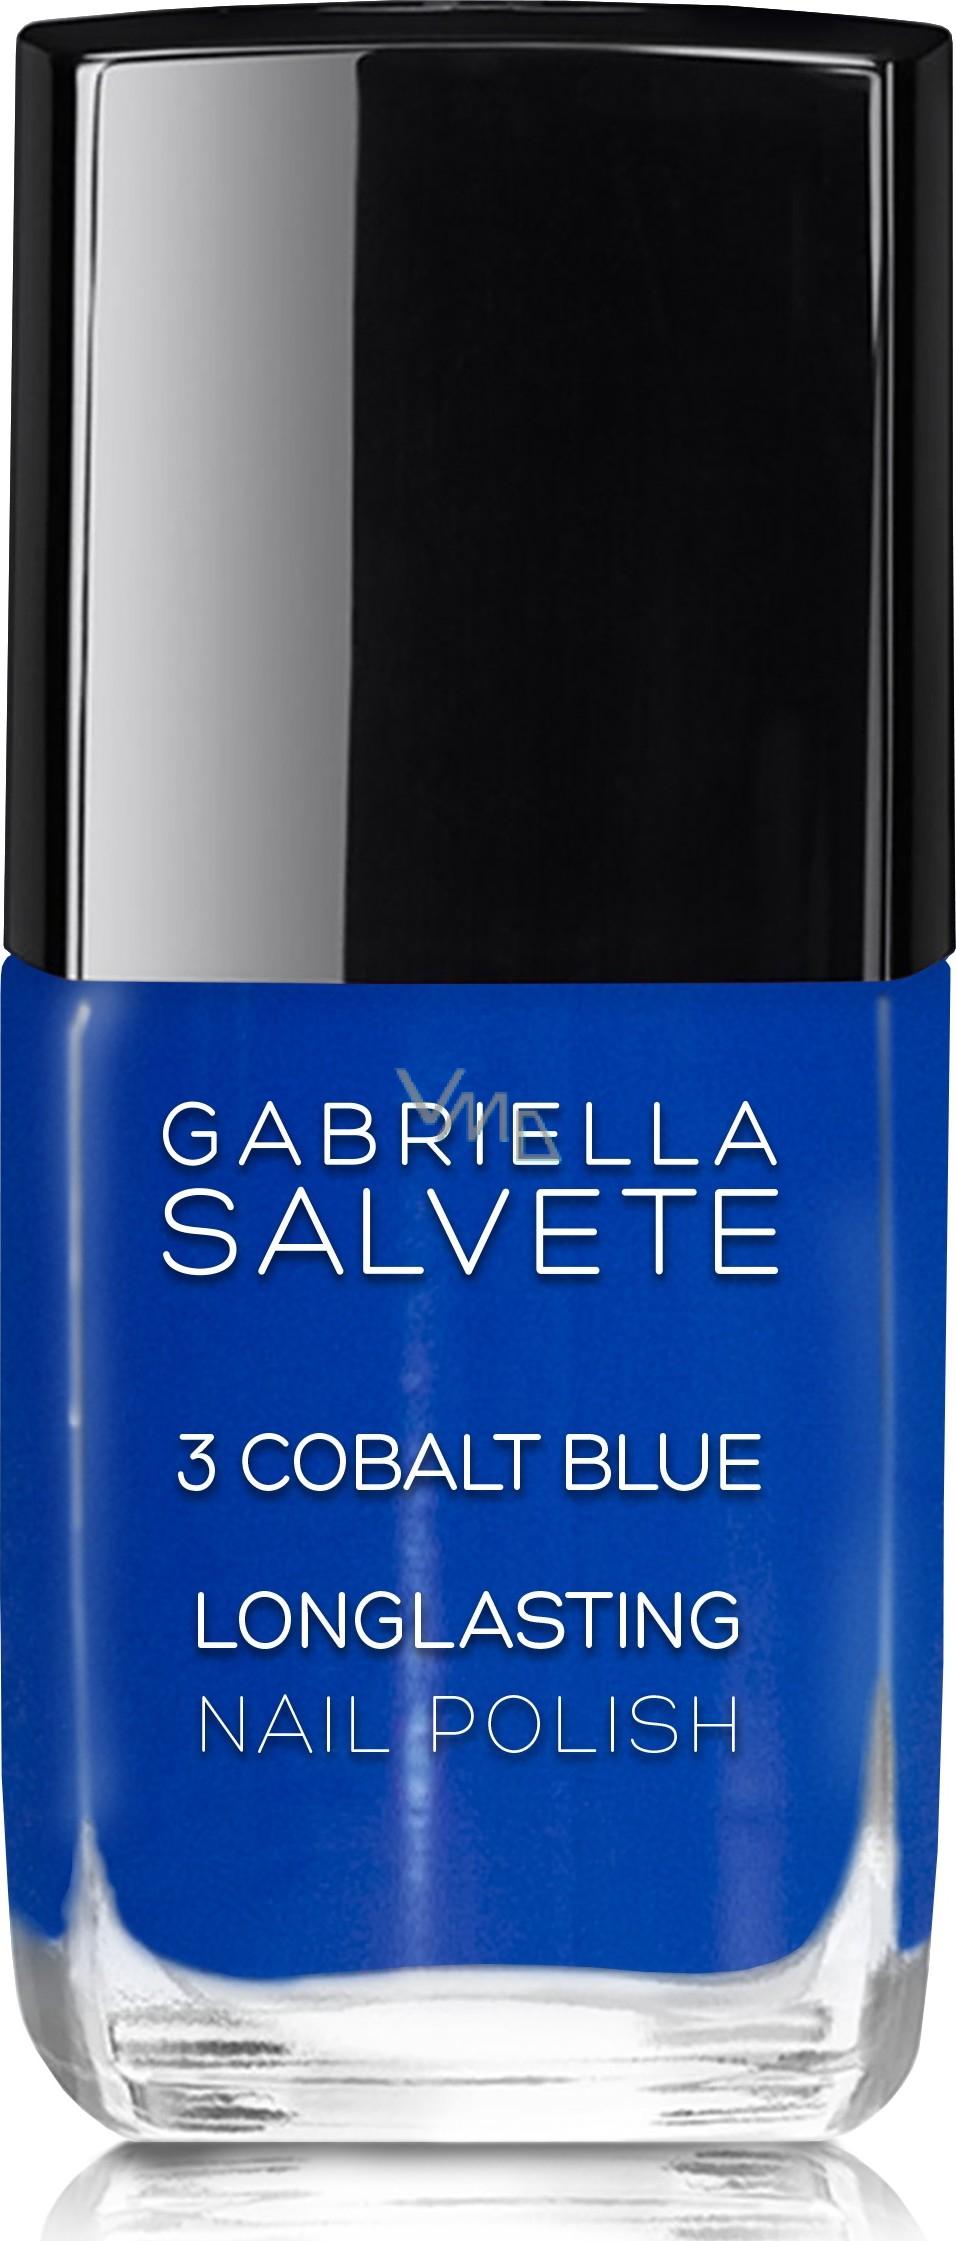 Gabriella Salvete Longlasting Enamel Nail Polish 03 Cobalt Blue 11 Ml Vmd Parfumerie Drogerie